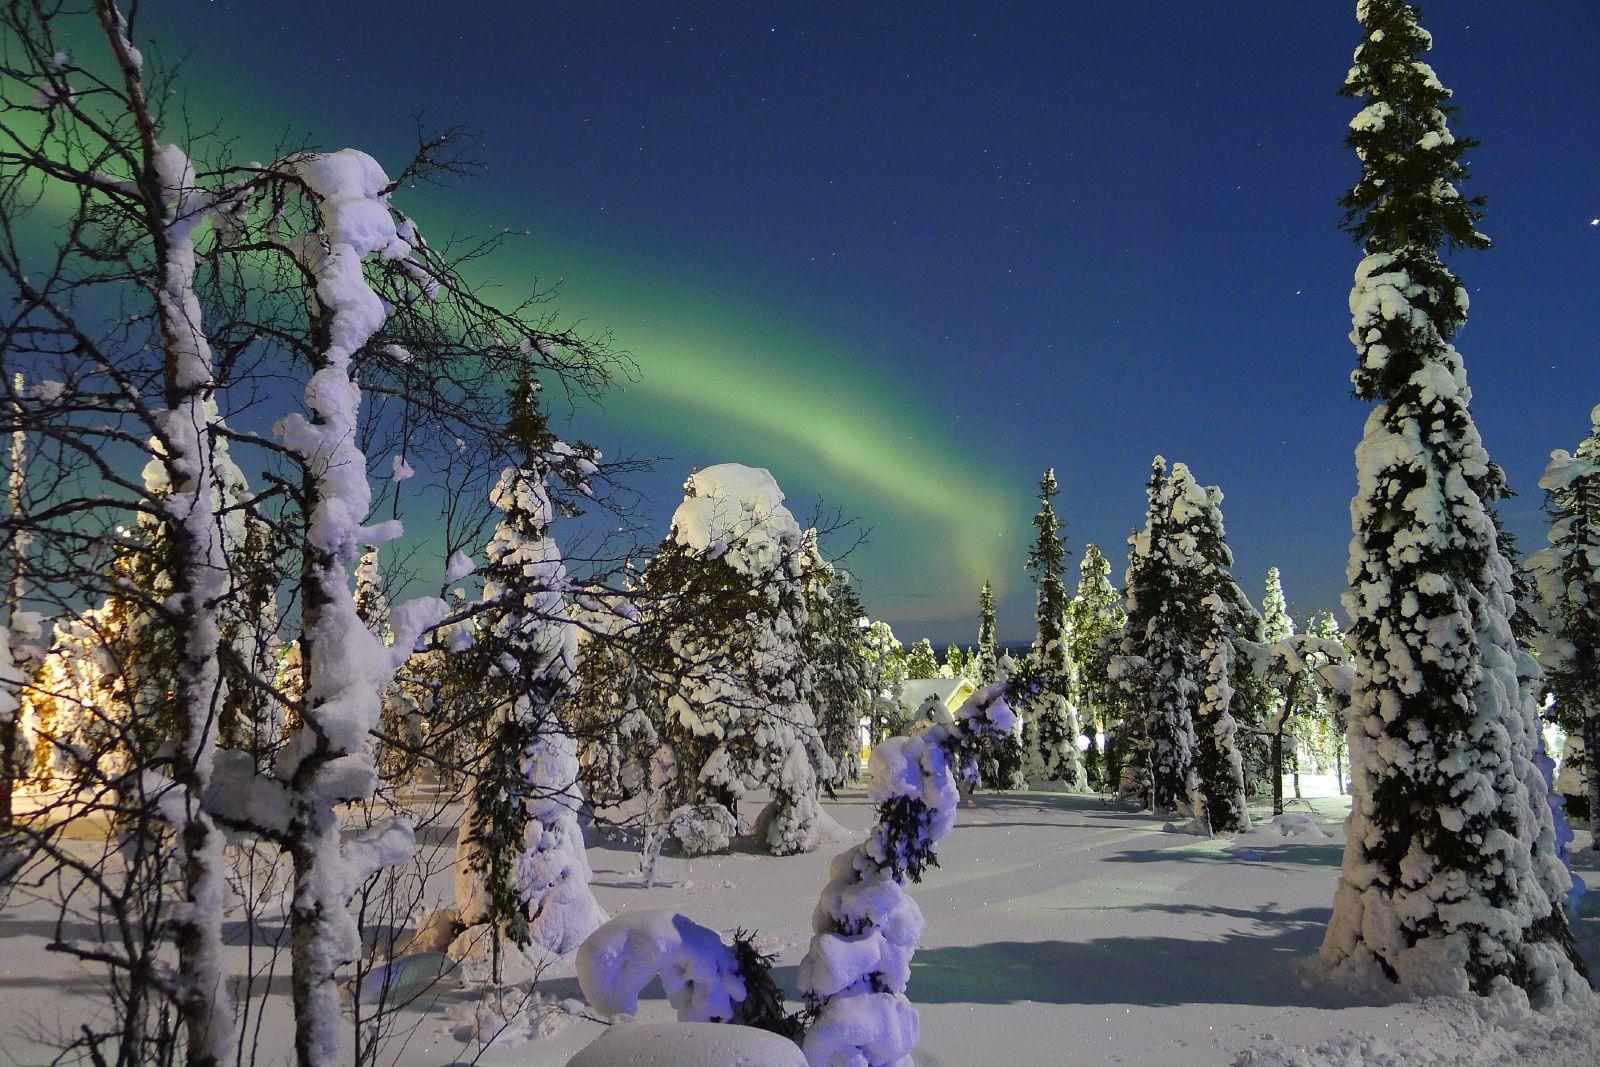 Finnland_Winter_Timo-Newton-Syms_flickr